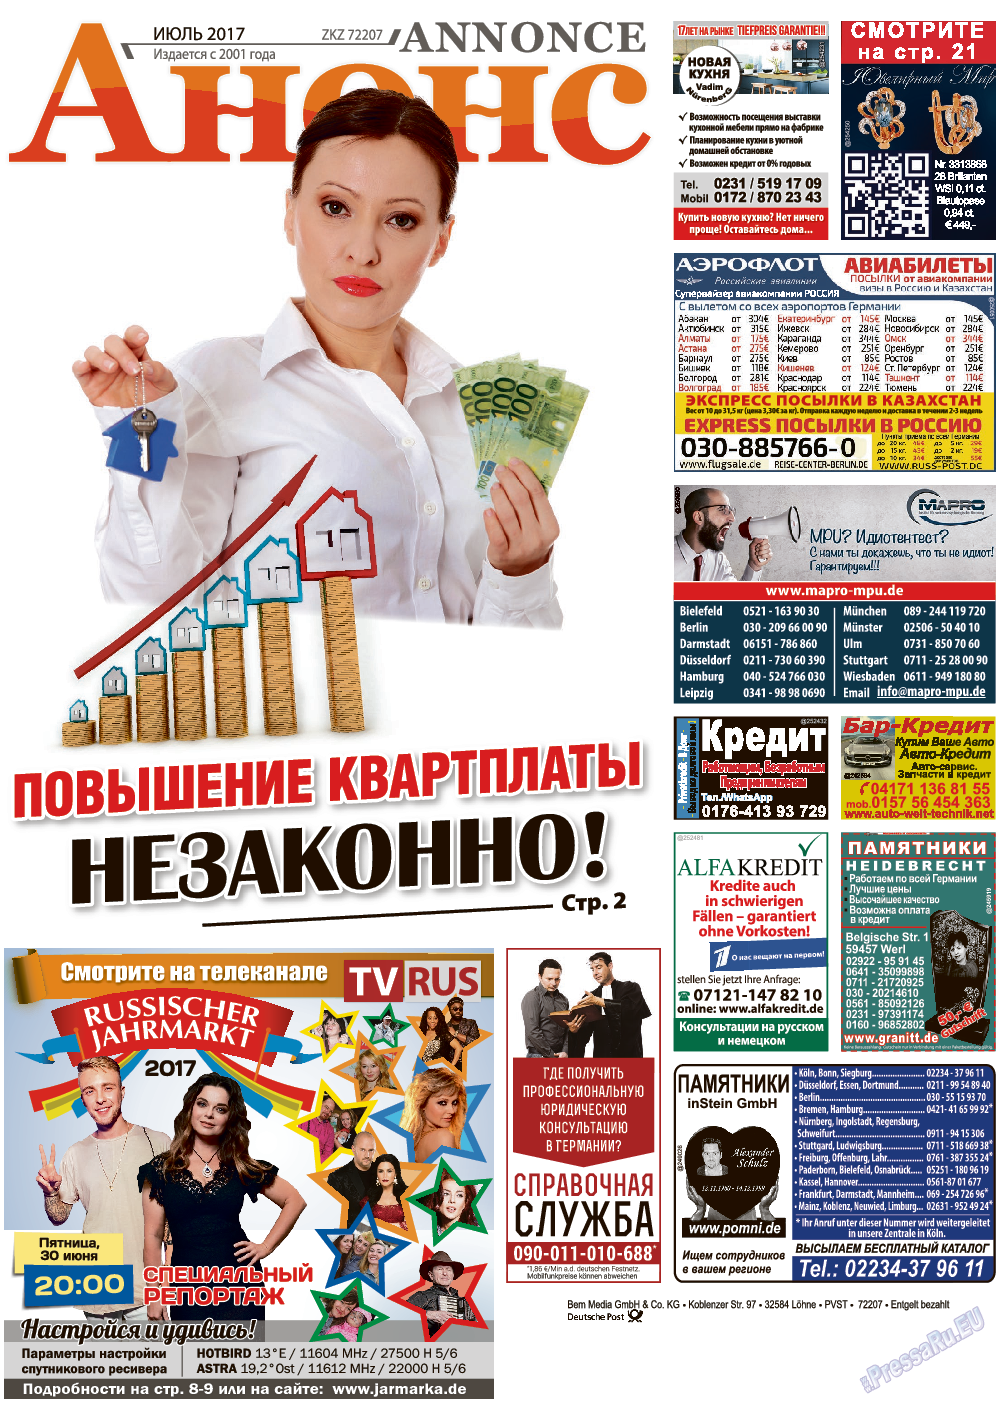 Анонс (газета). 2017 год, номер 7, стр. 1